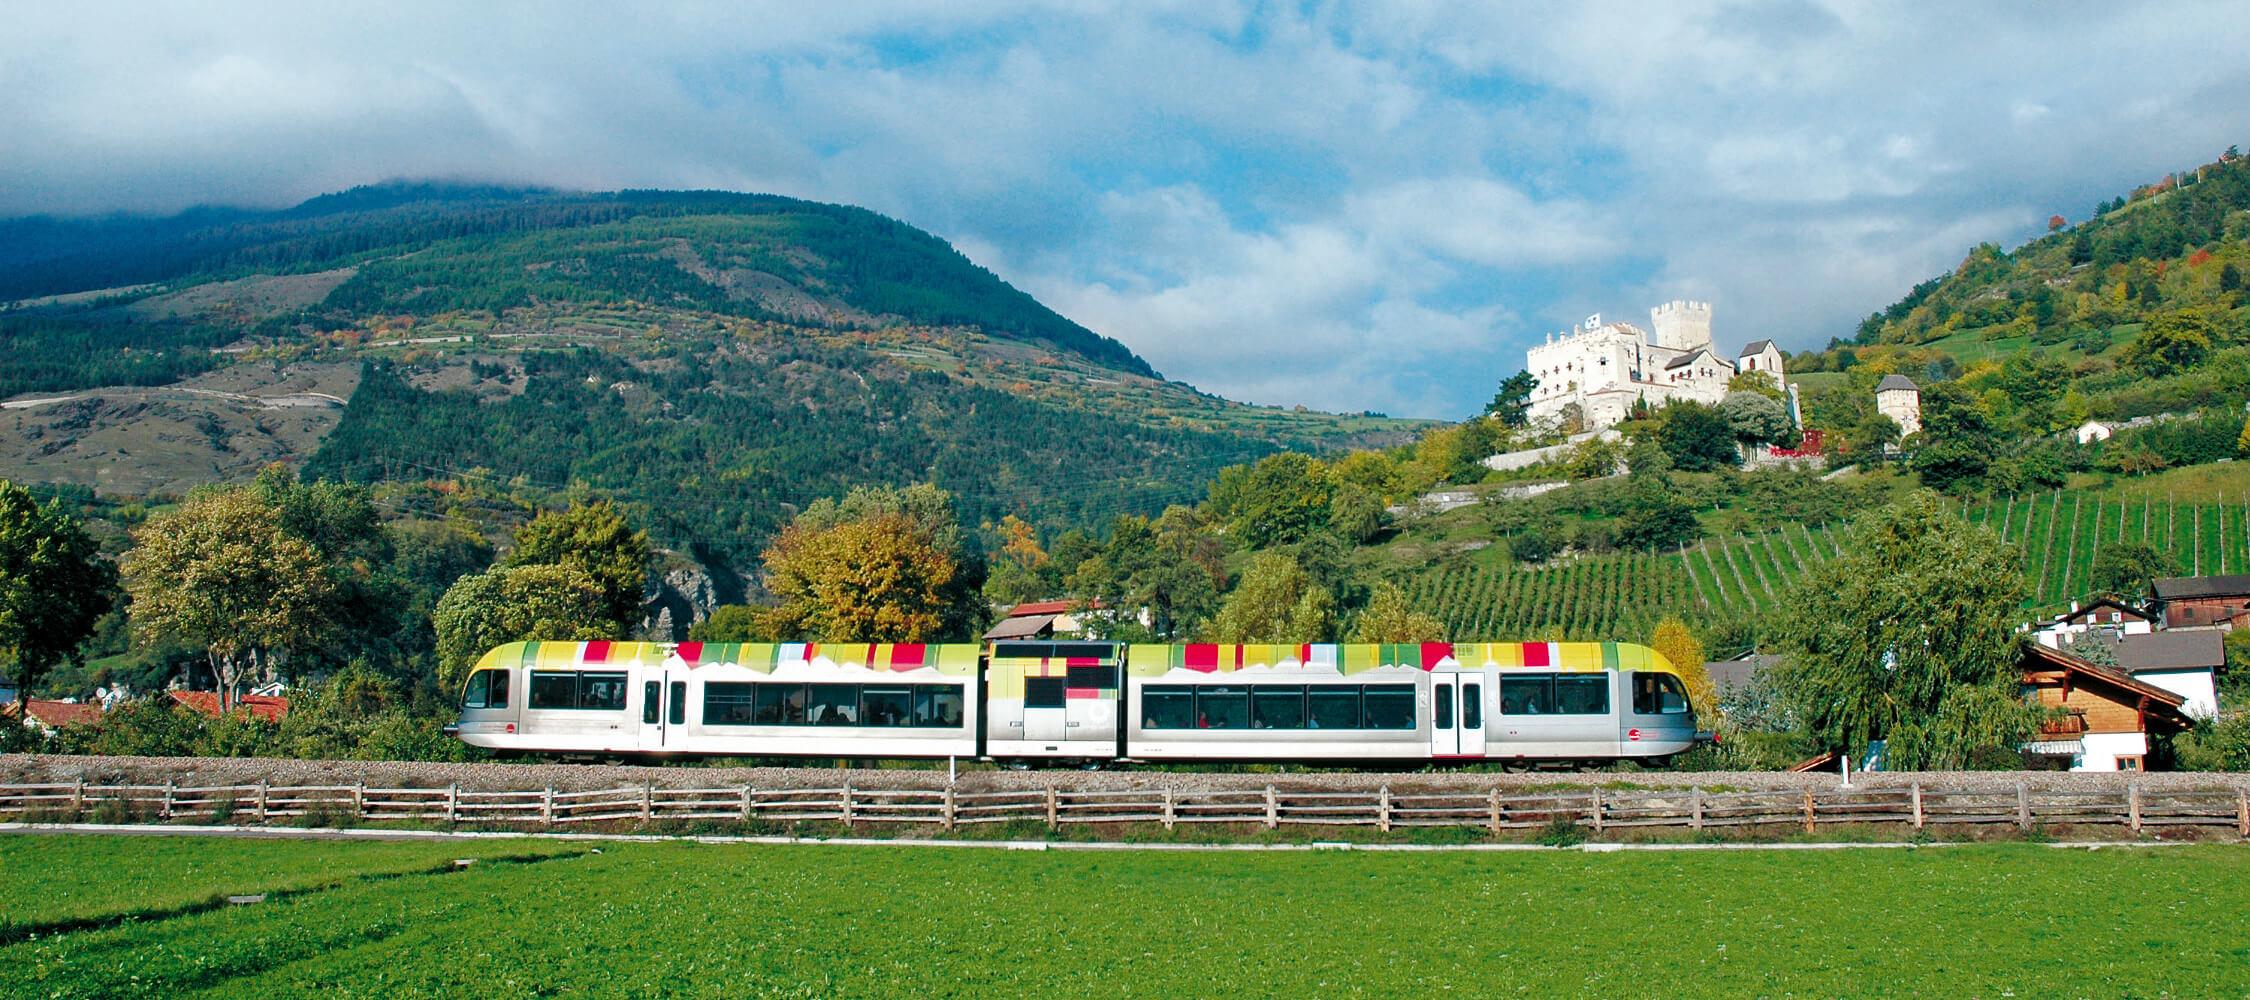 Italien-Trentino_Suedtirol_Alto_Adige_Merano_Meran_Besichtigen_Natur_Zug_Mobilcard_IDM-Hans-Peter-Leu_smg00634hape_2250x1000